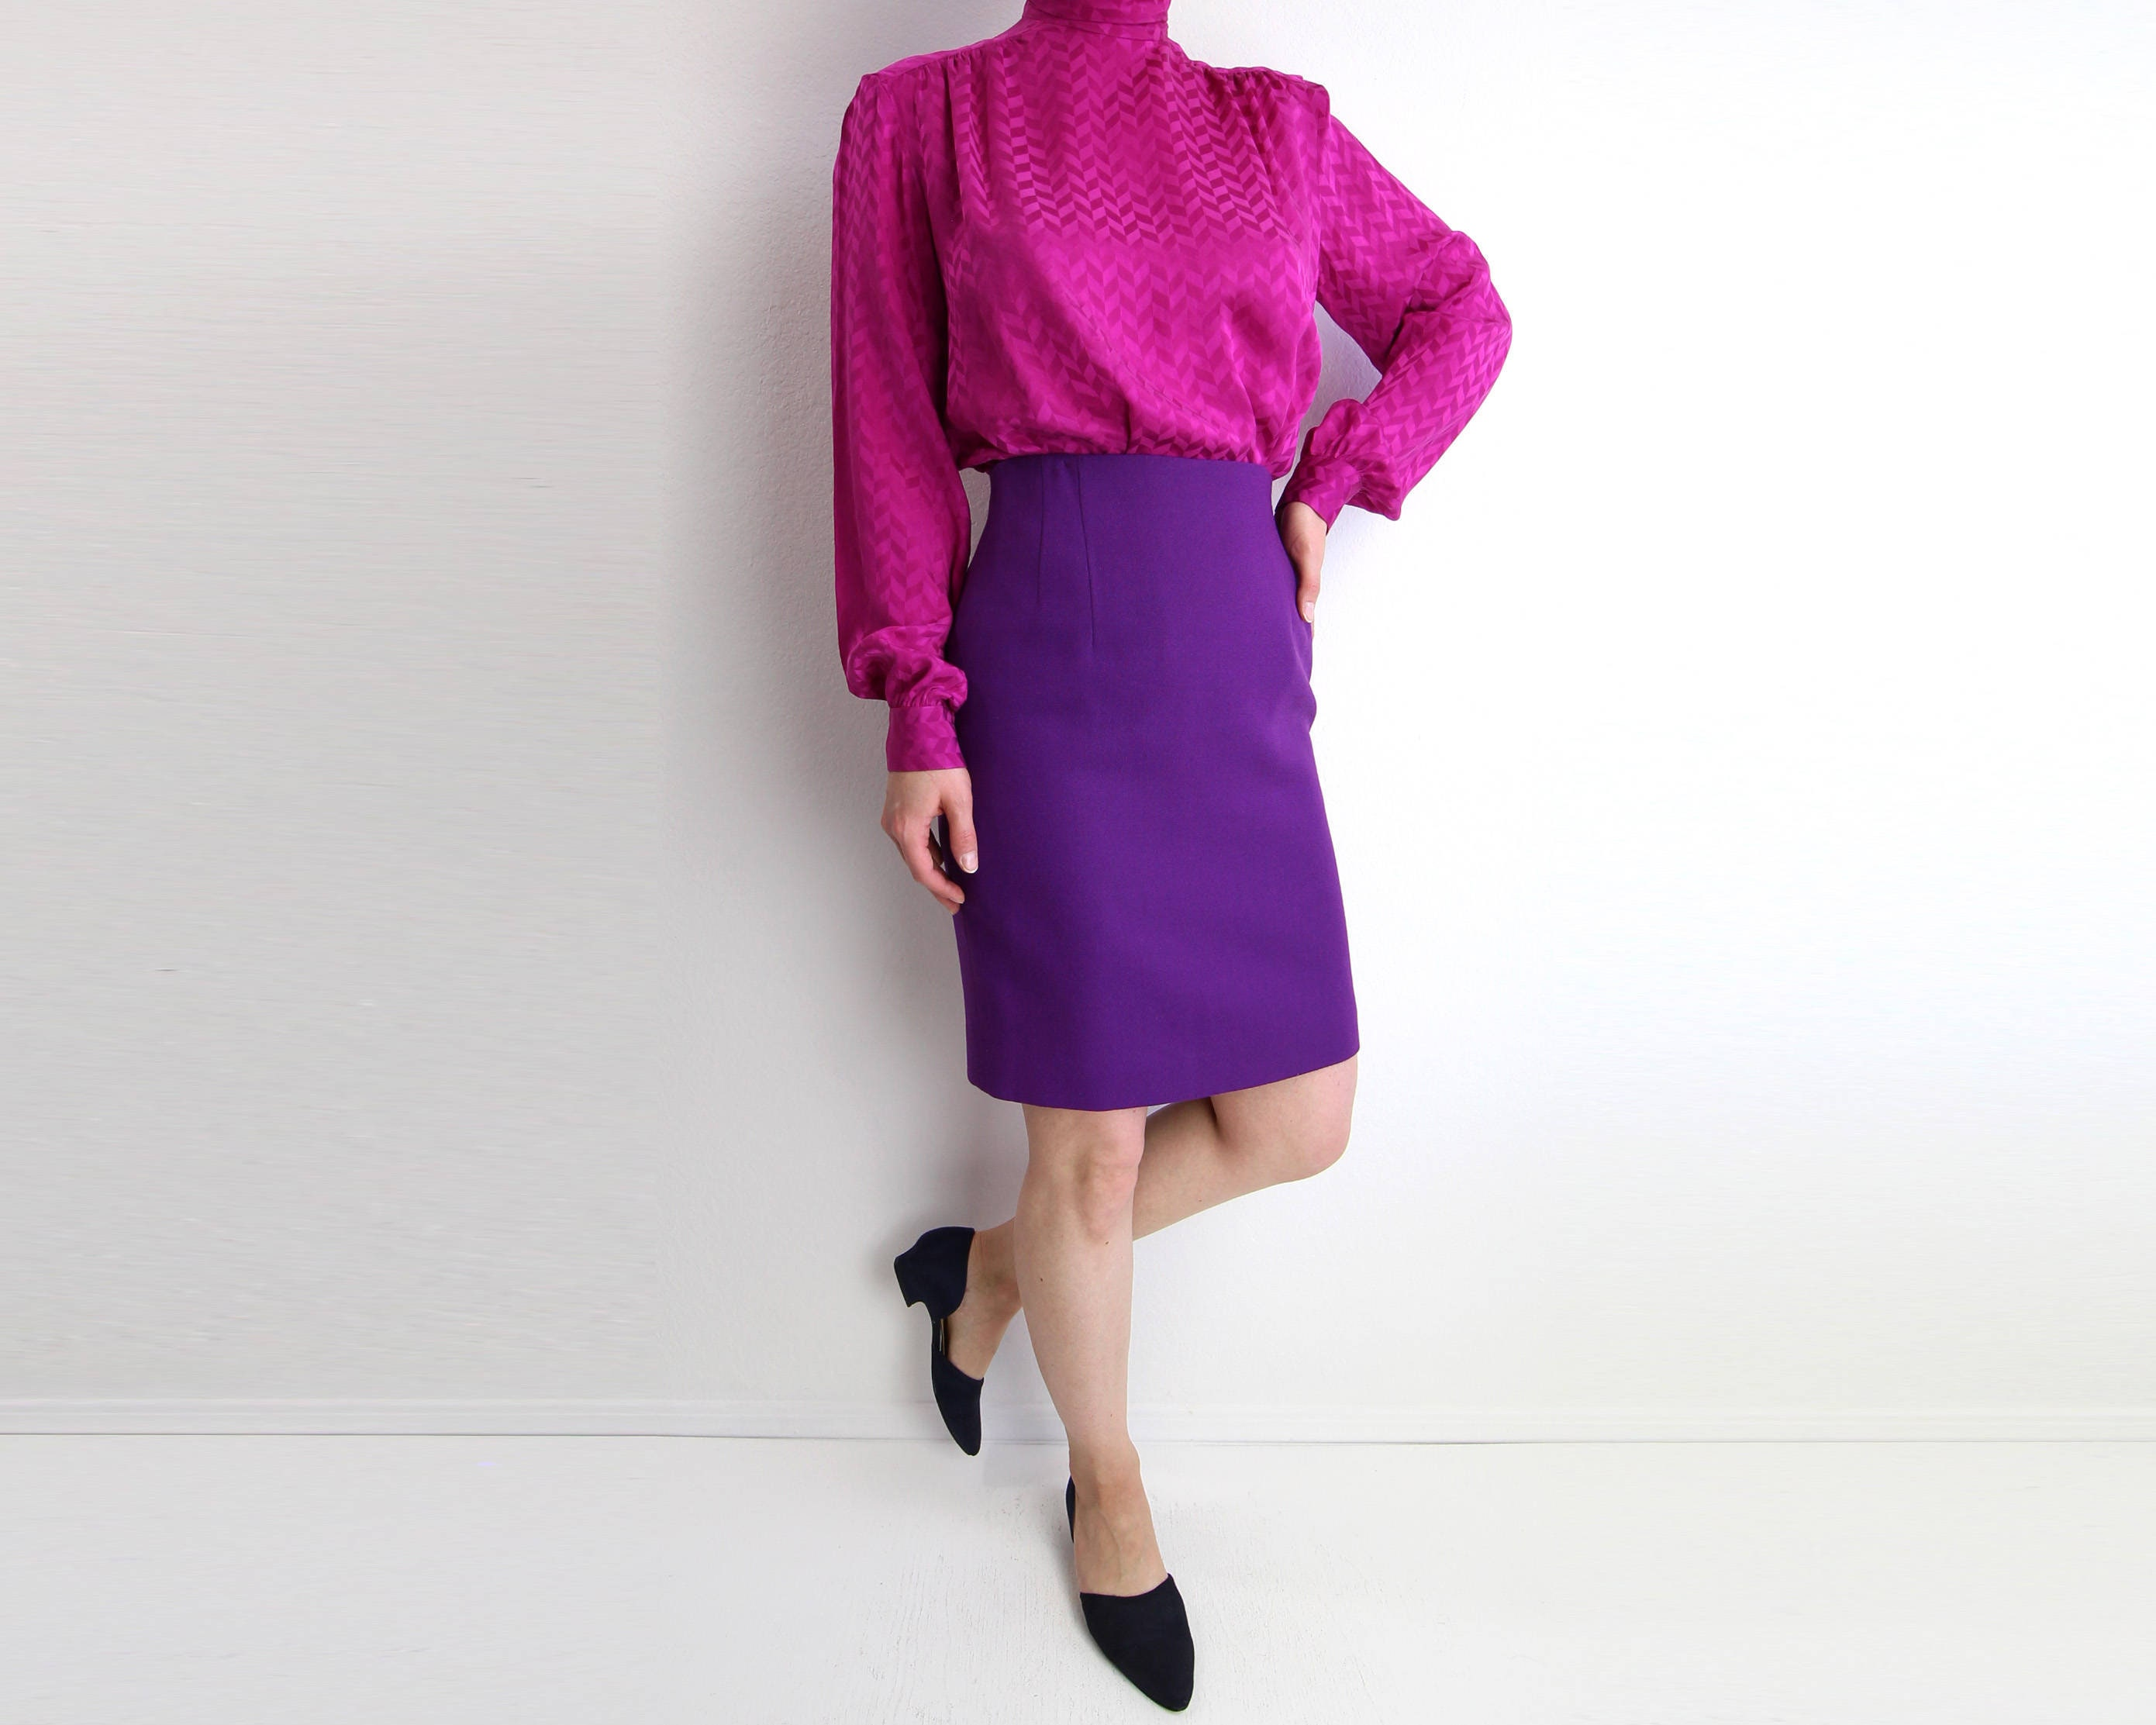 b99404b56ae Vintage Skirt Purple Skirt Pencil Skirt High Waist Short Wool Womens ...